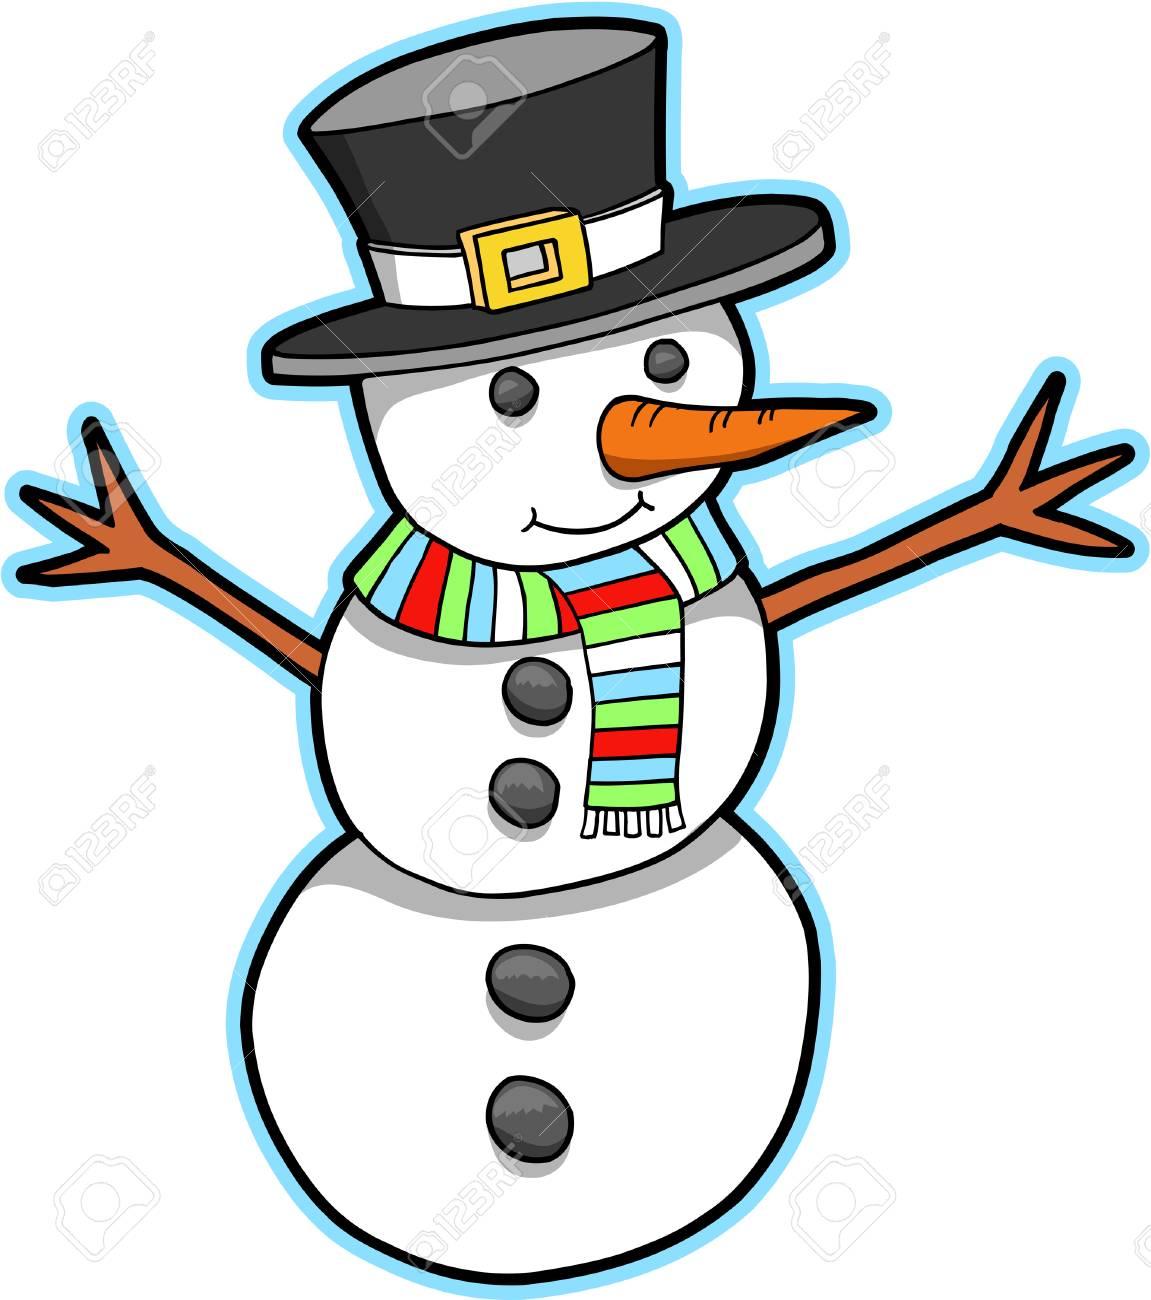 Snowman Vector Illustration Stock Vector - 3290716